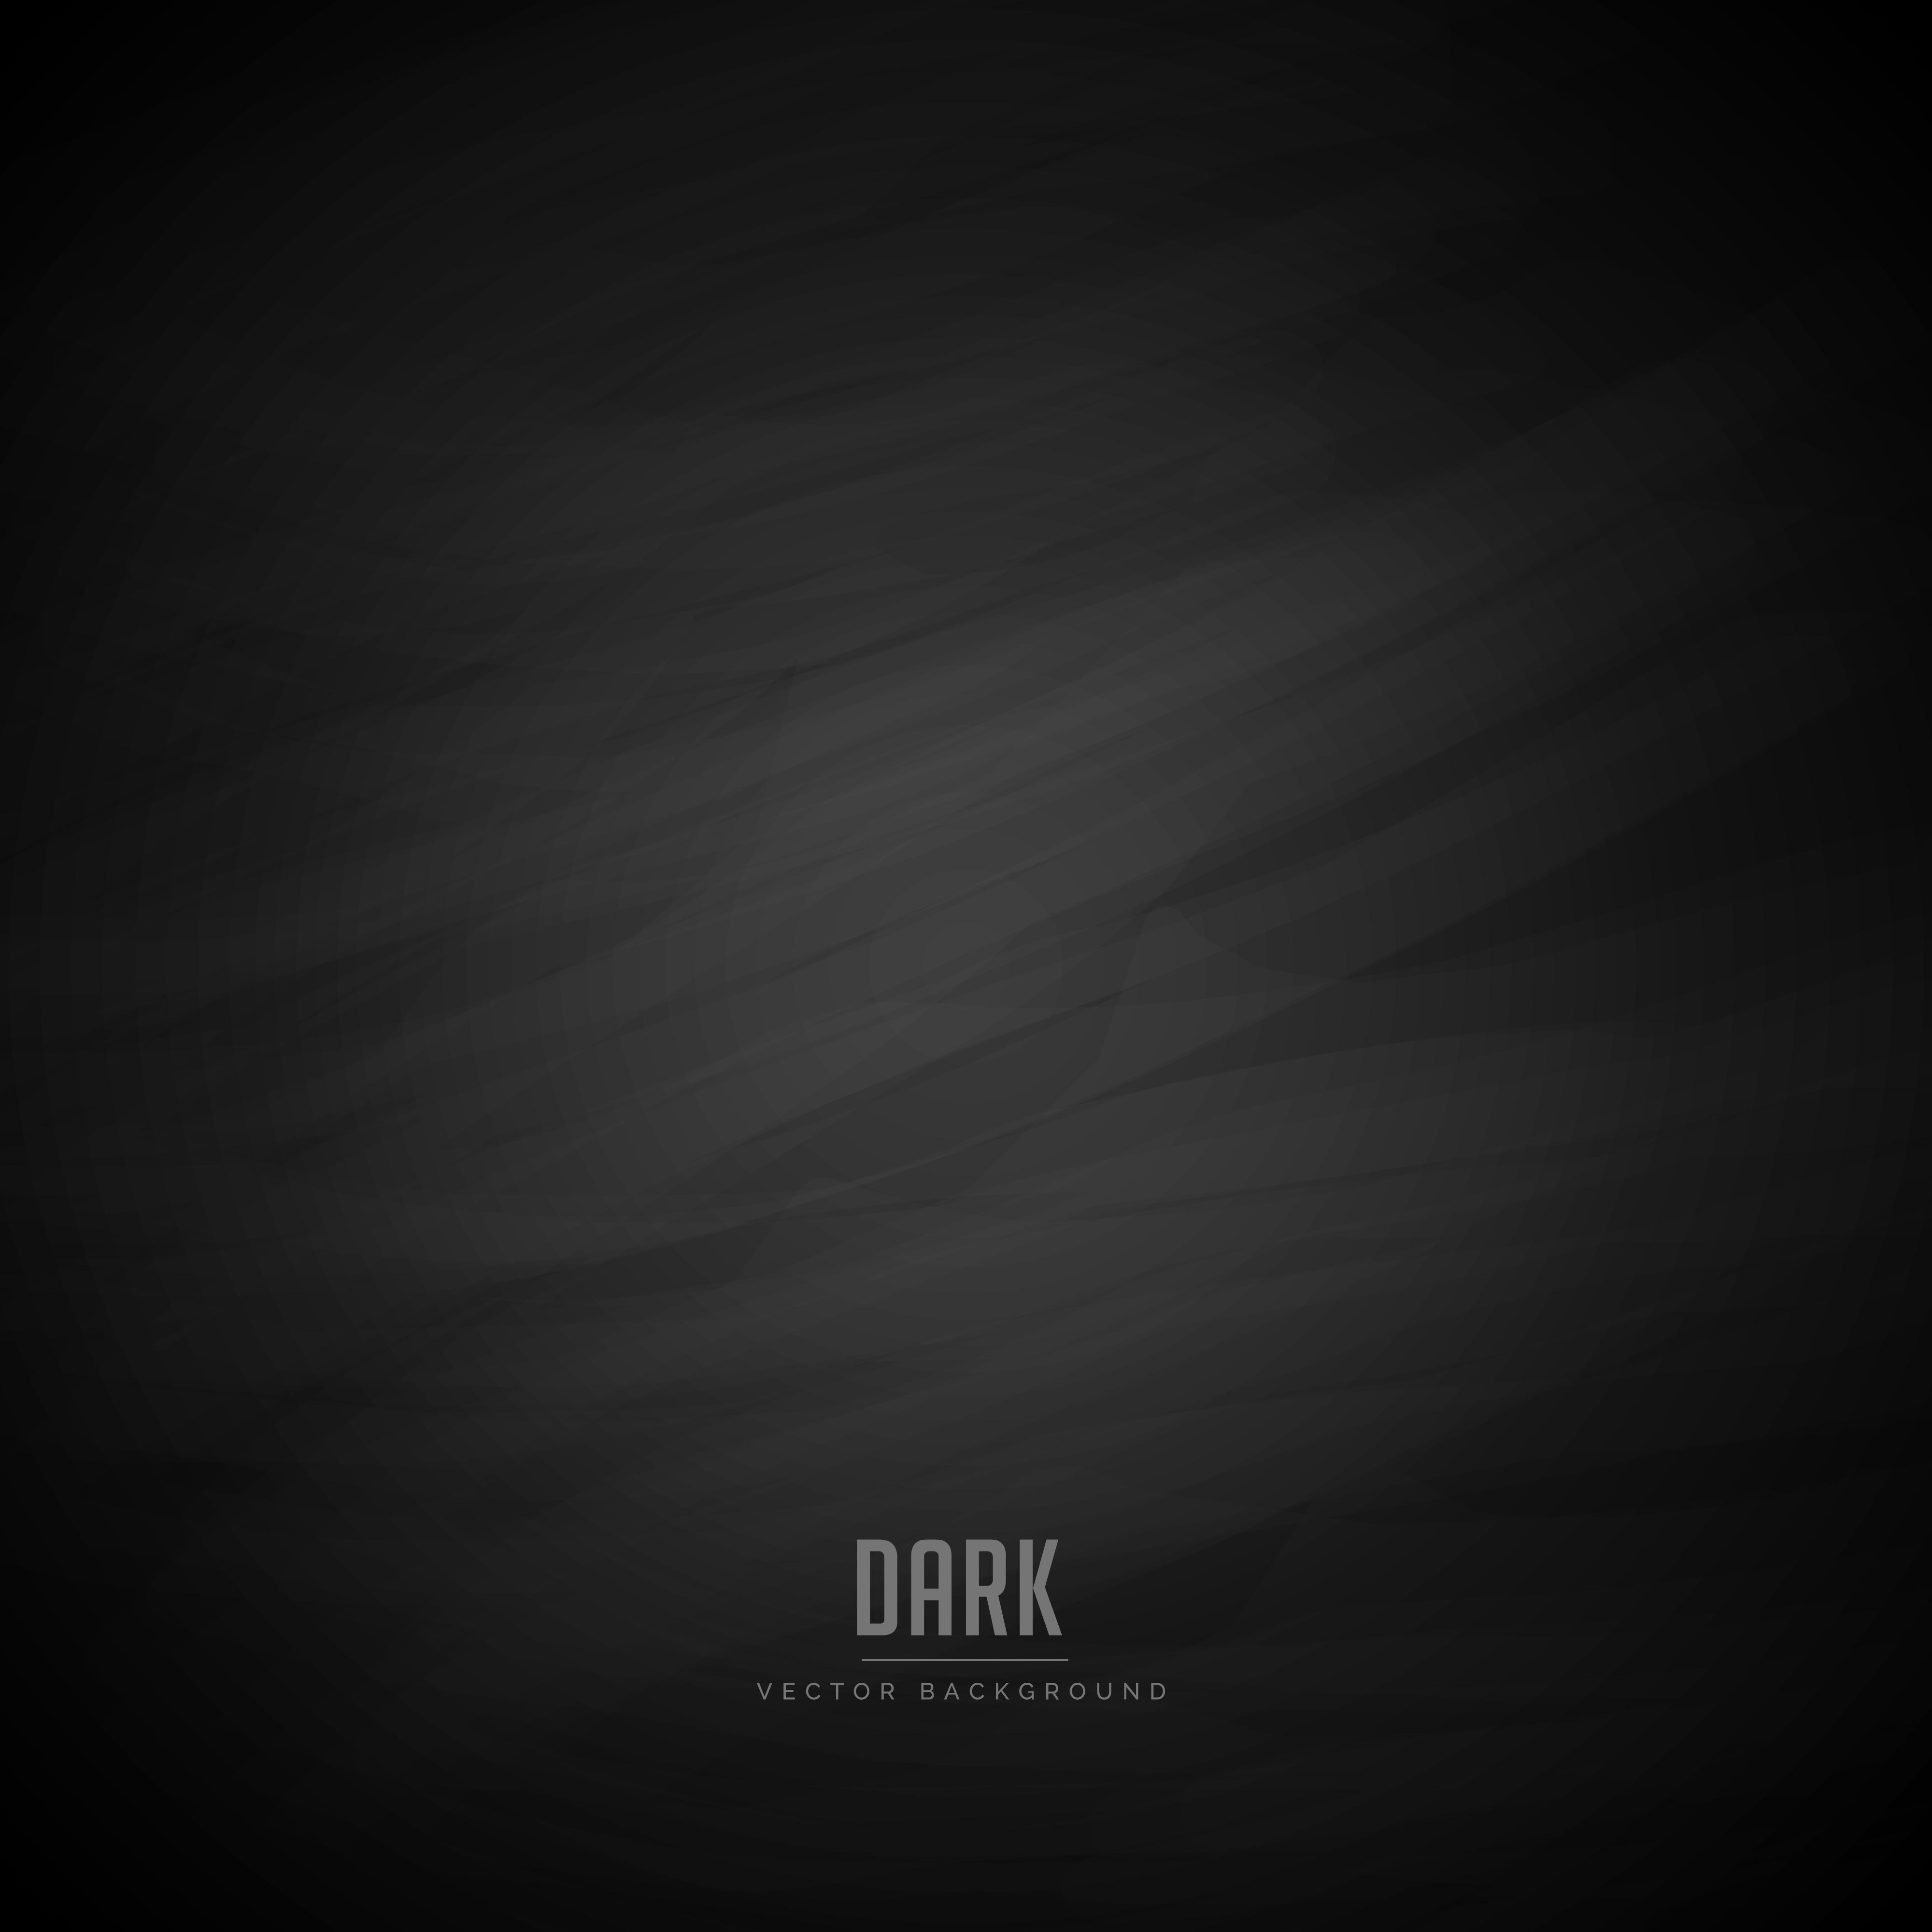 dark abstract vector background design - Download Free ... - photo #2